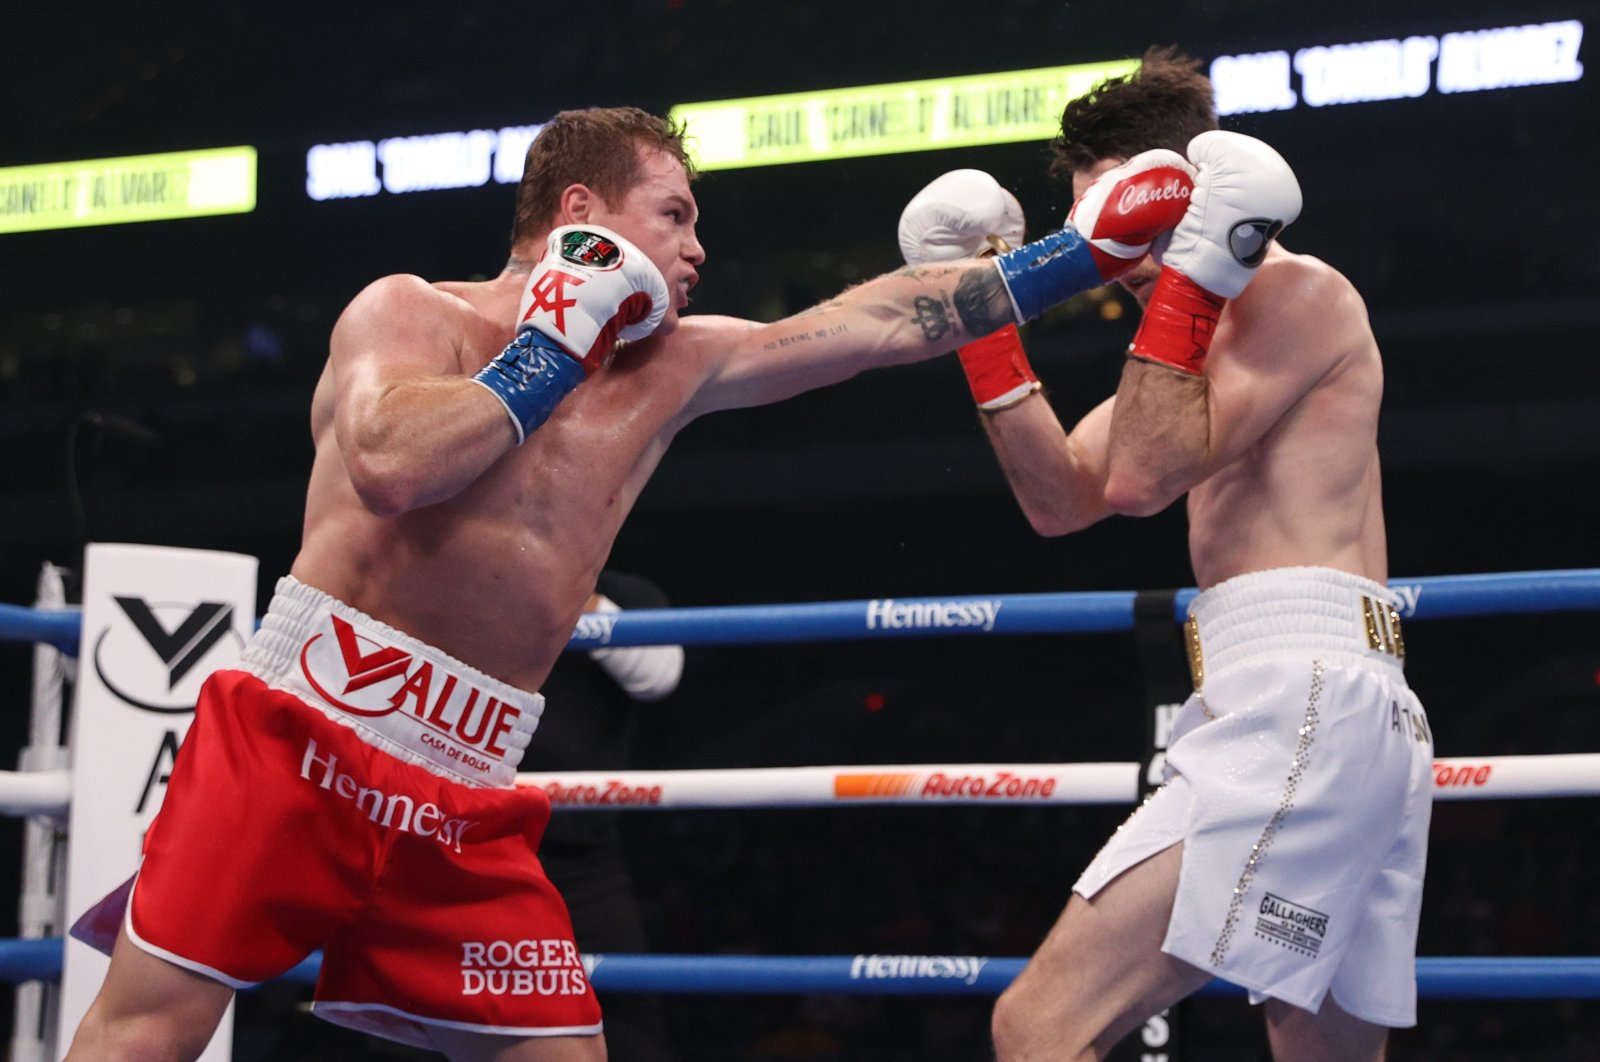 Canelo Alvarez  (L) and Callum Smith during their championship bout, San Antonio, Texas, U.S., Dec. 19, 2020. (REUTERS PHOTO)